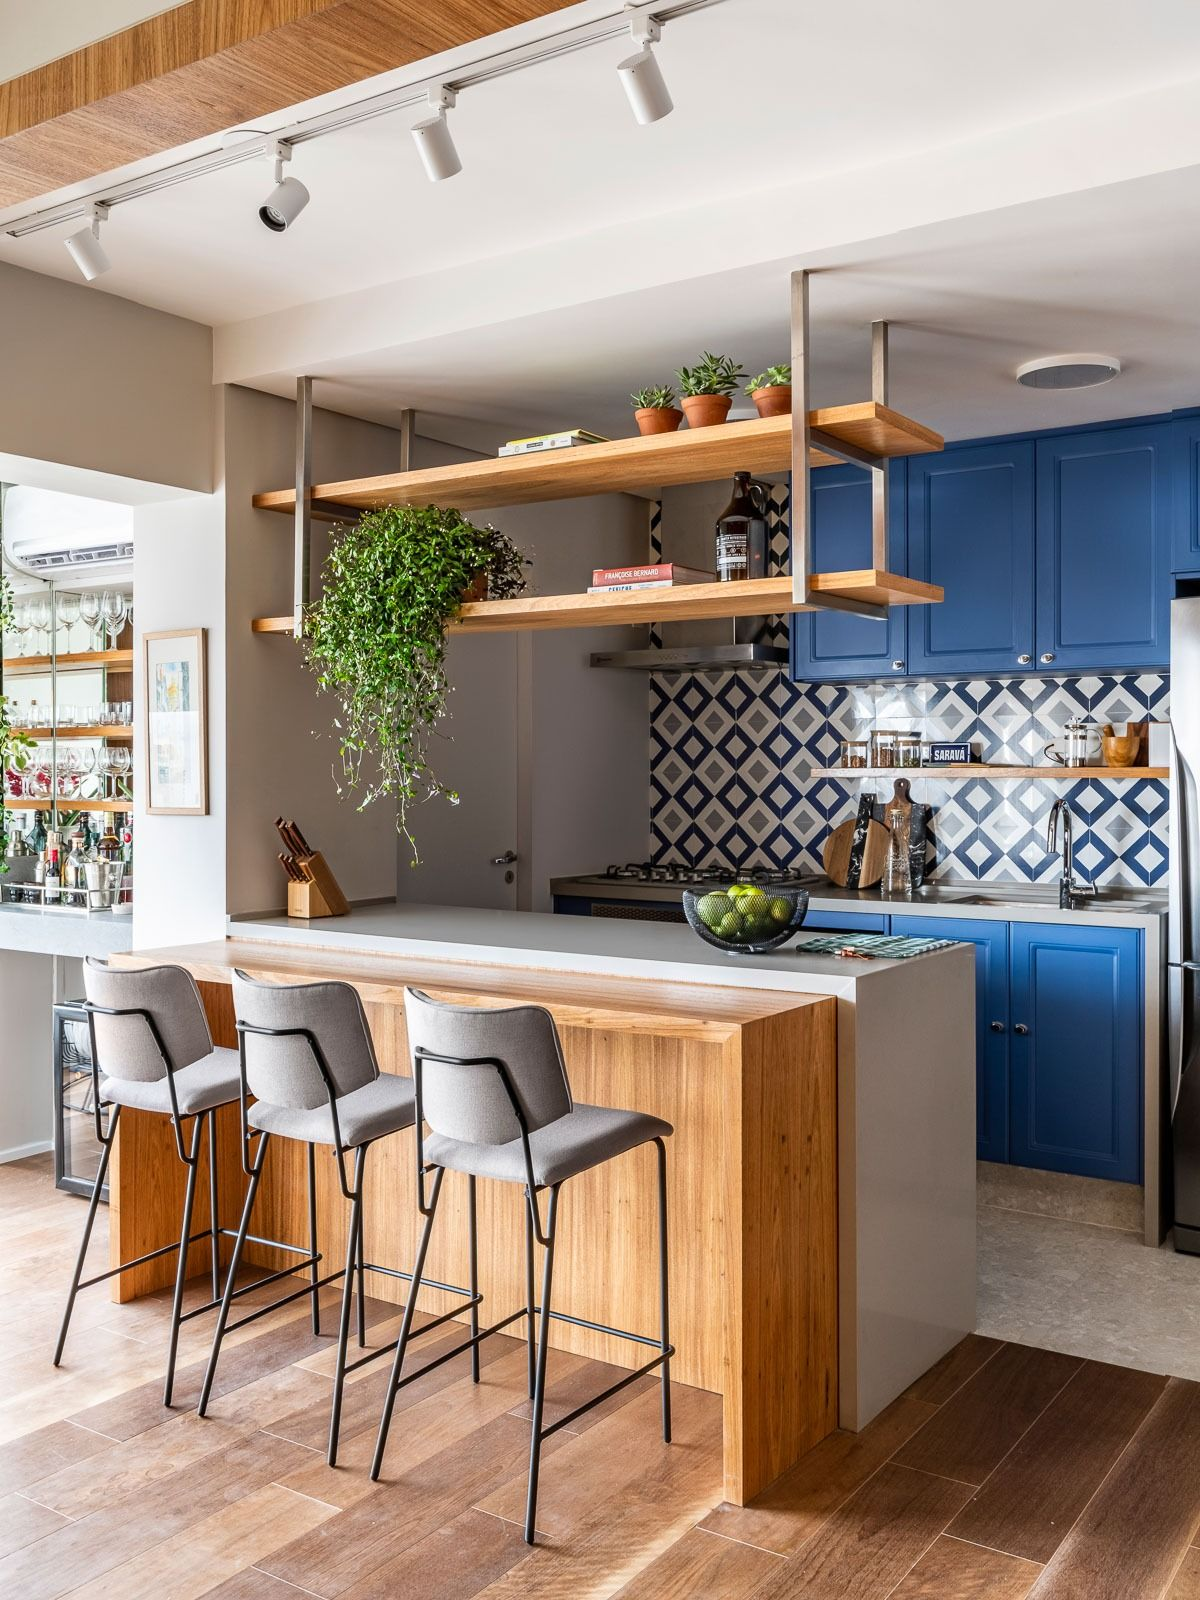 Bancada de granito branca para cozinha azul